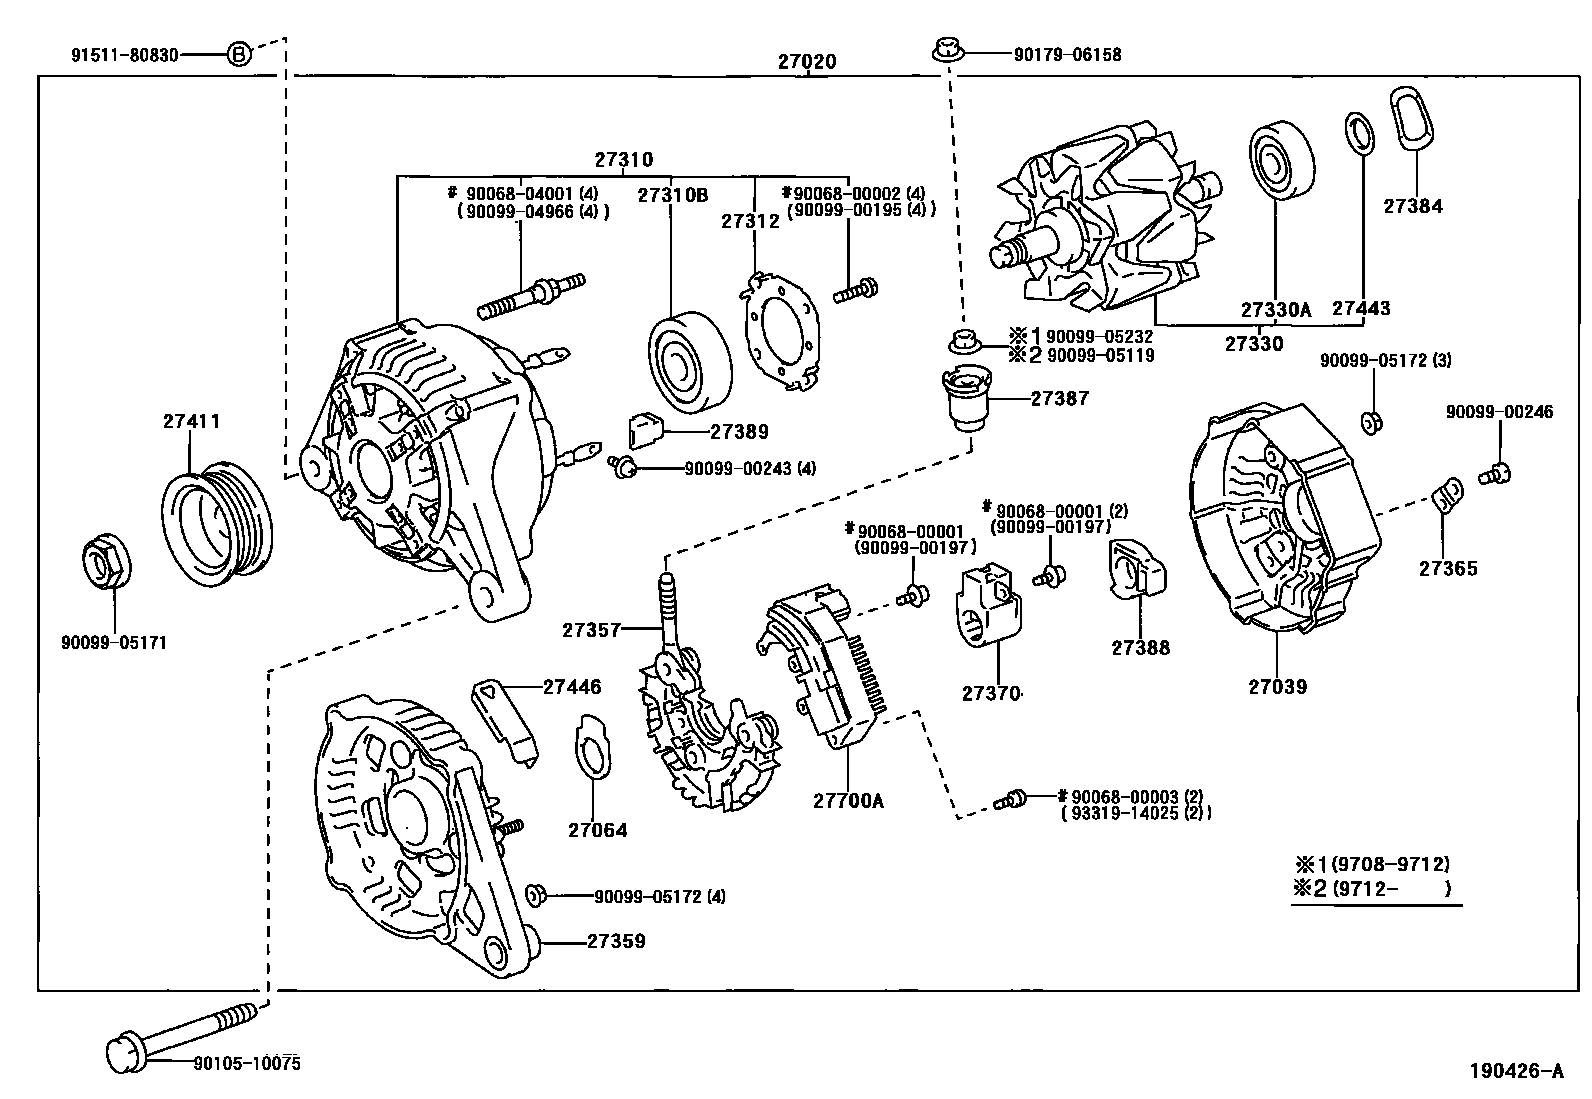 honda 5 speed manual transmission diagram image details rh motogurumag com 1995 ford f150 5 speed manual transmission diagram 1995 ford f150 5 speed manual transmission diagram